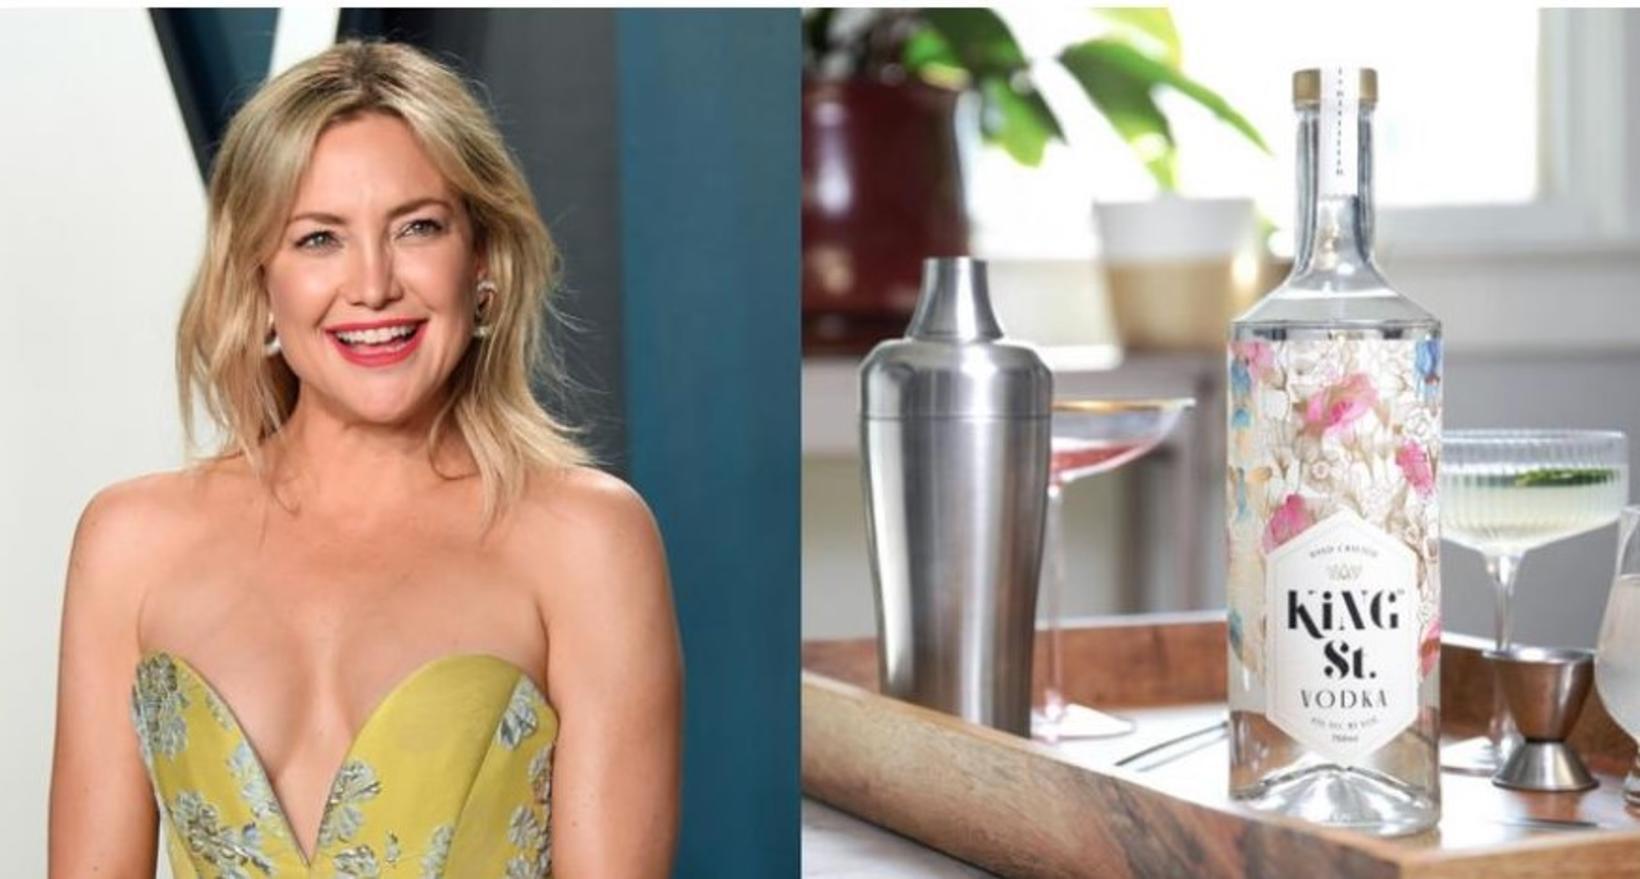 Yndislega Kate Hudson framleiðir vodka sem kallast King St. Vodka. …